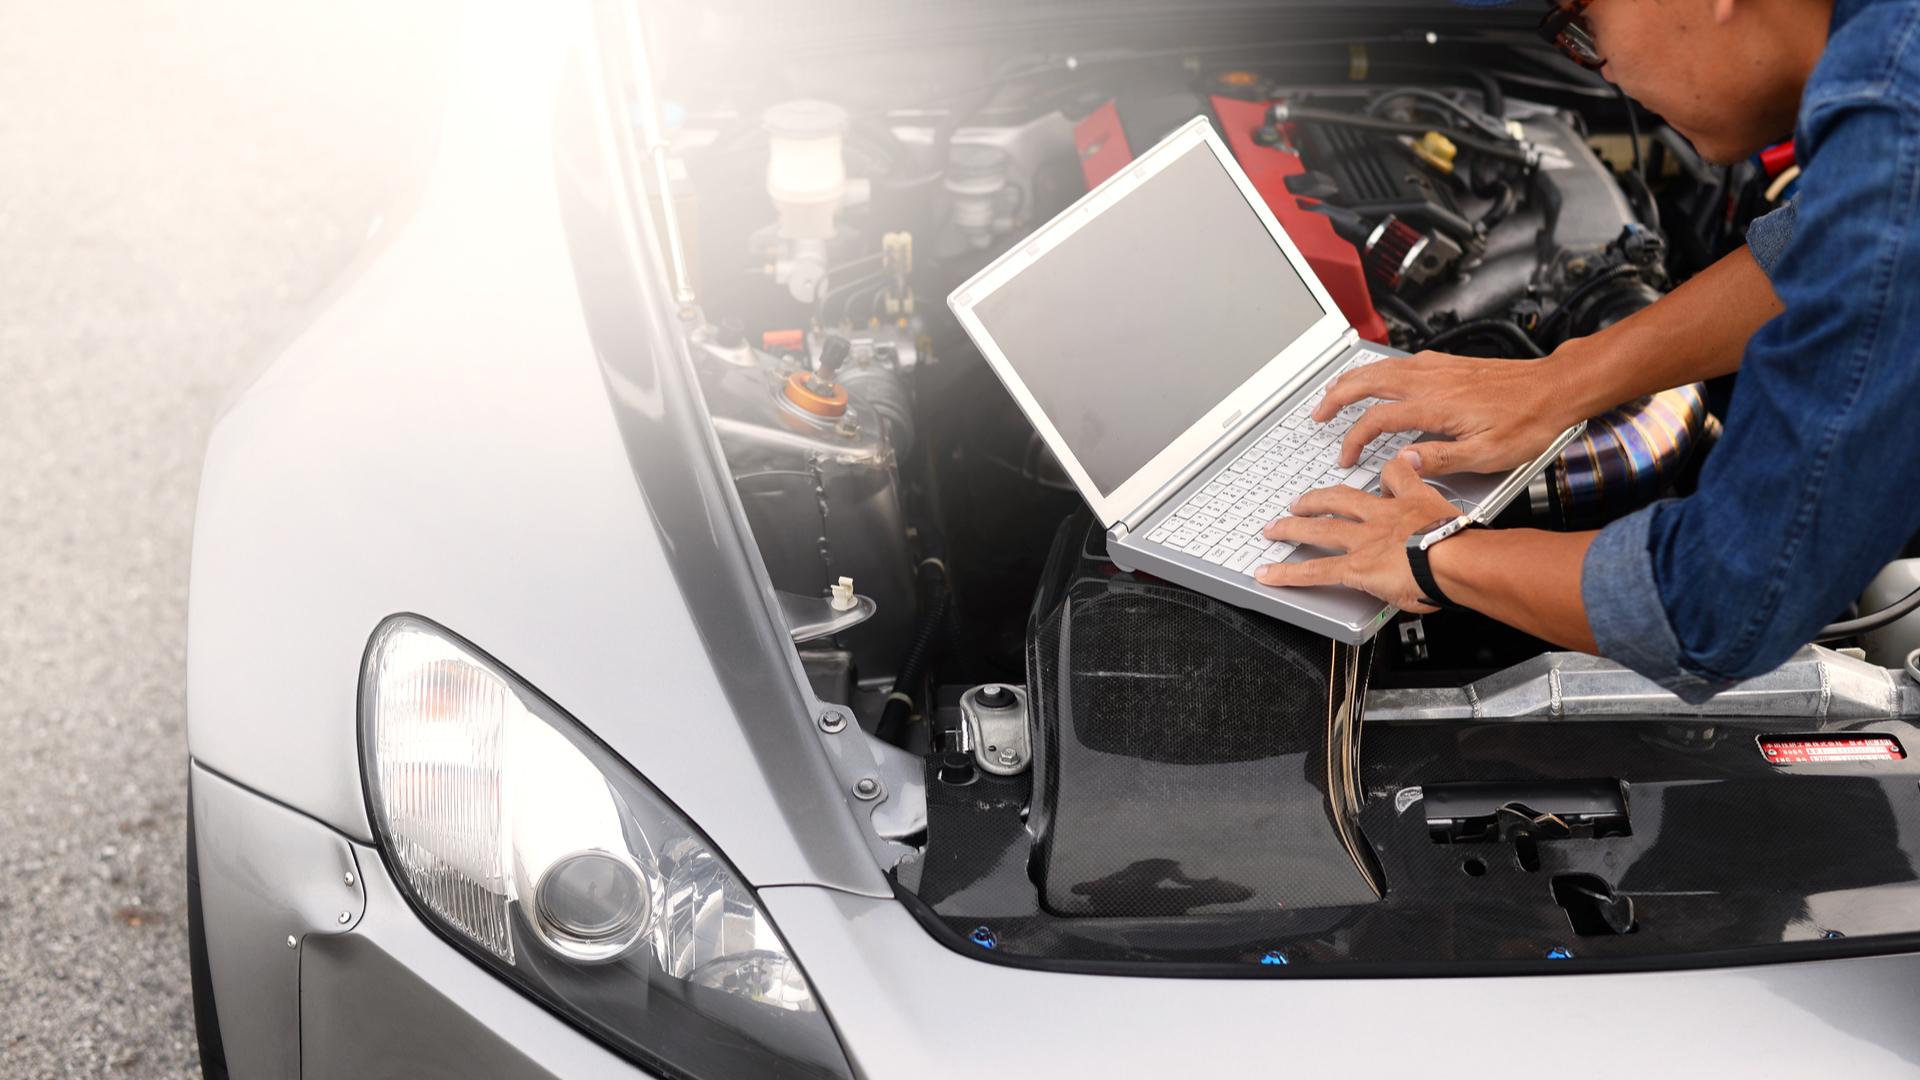 Modified Car Insurance FAQs Header Image